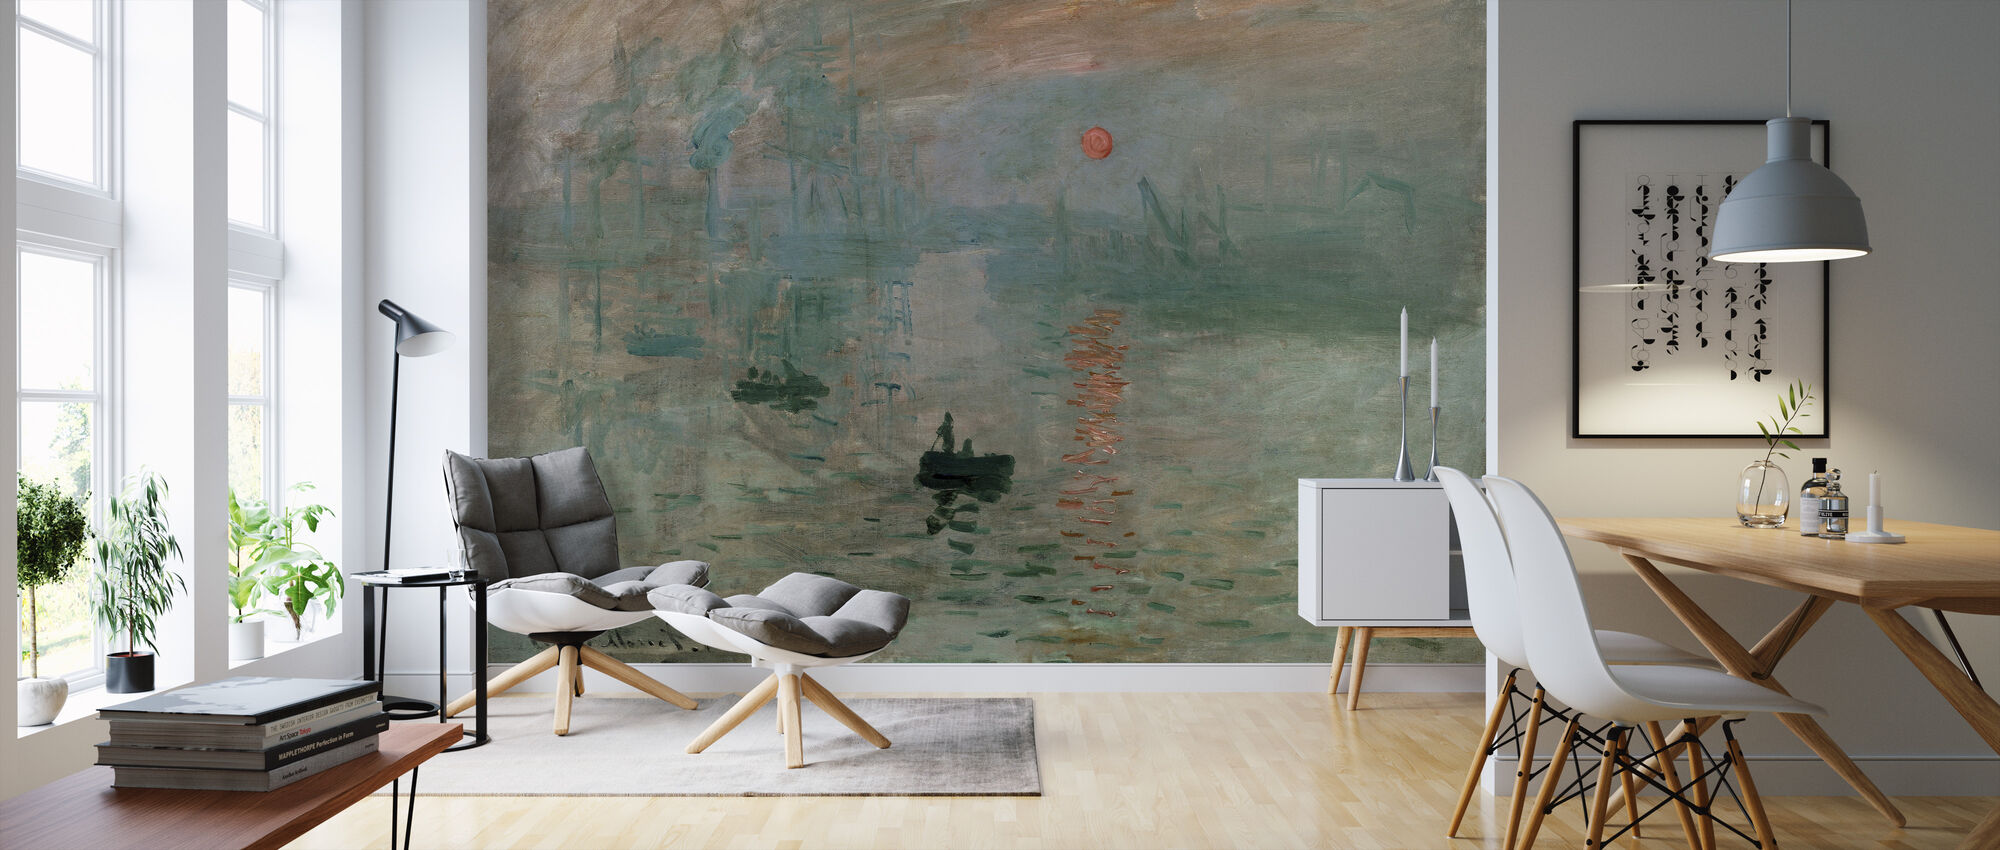 Monet, Claud - Impression - Wallpaper - Living Room